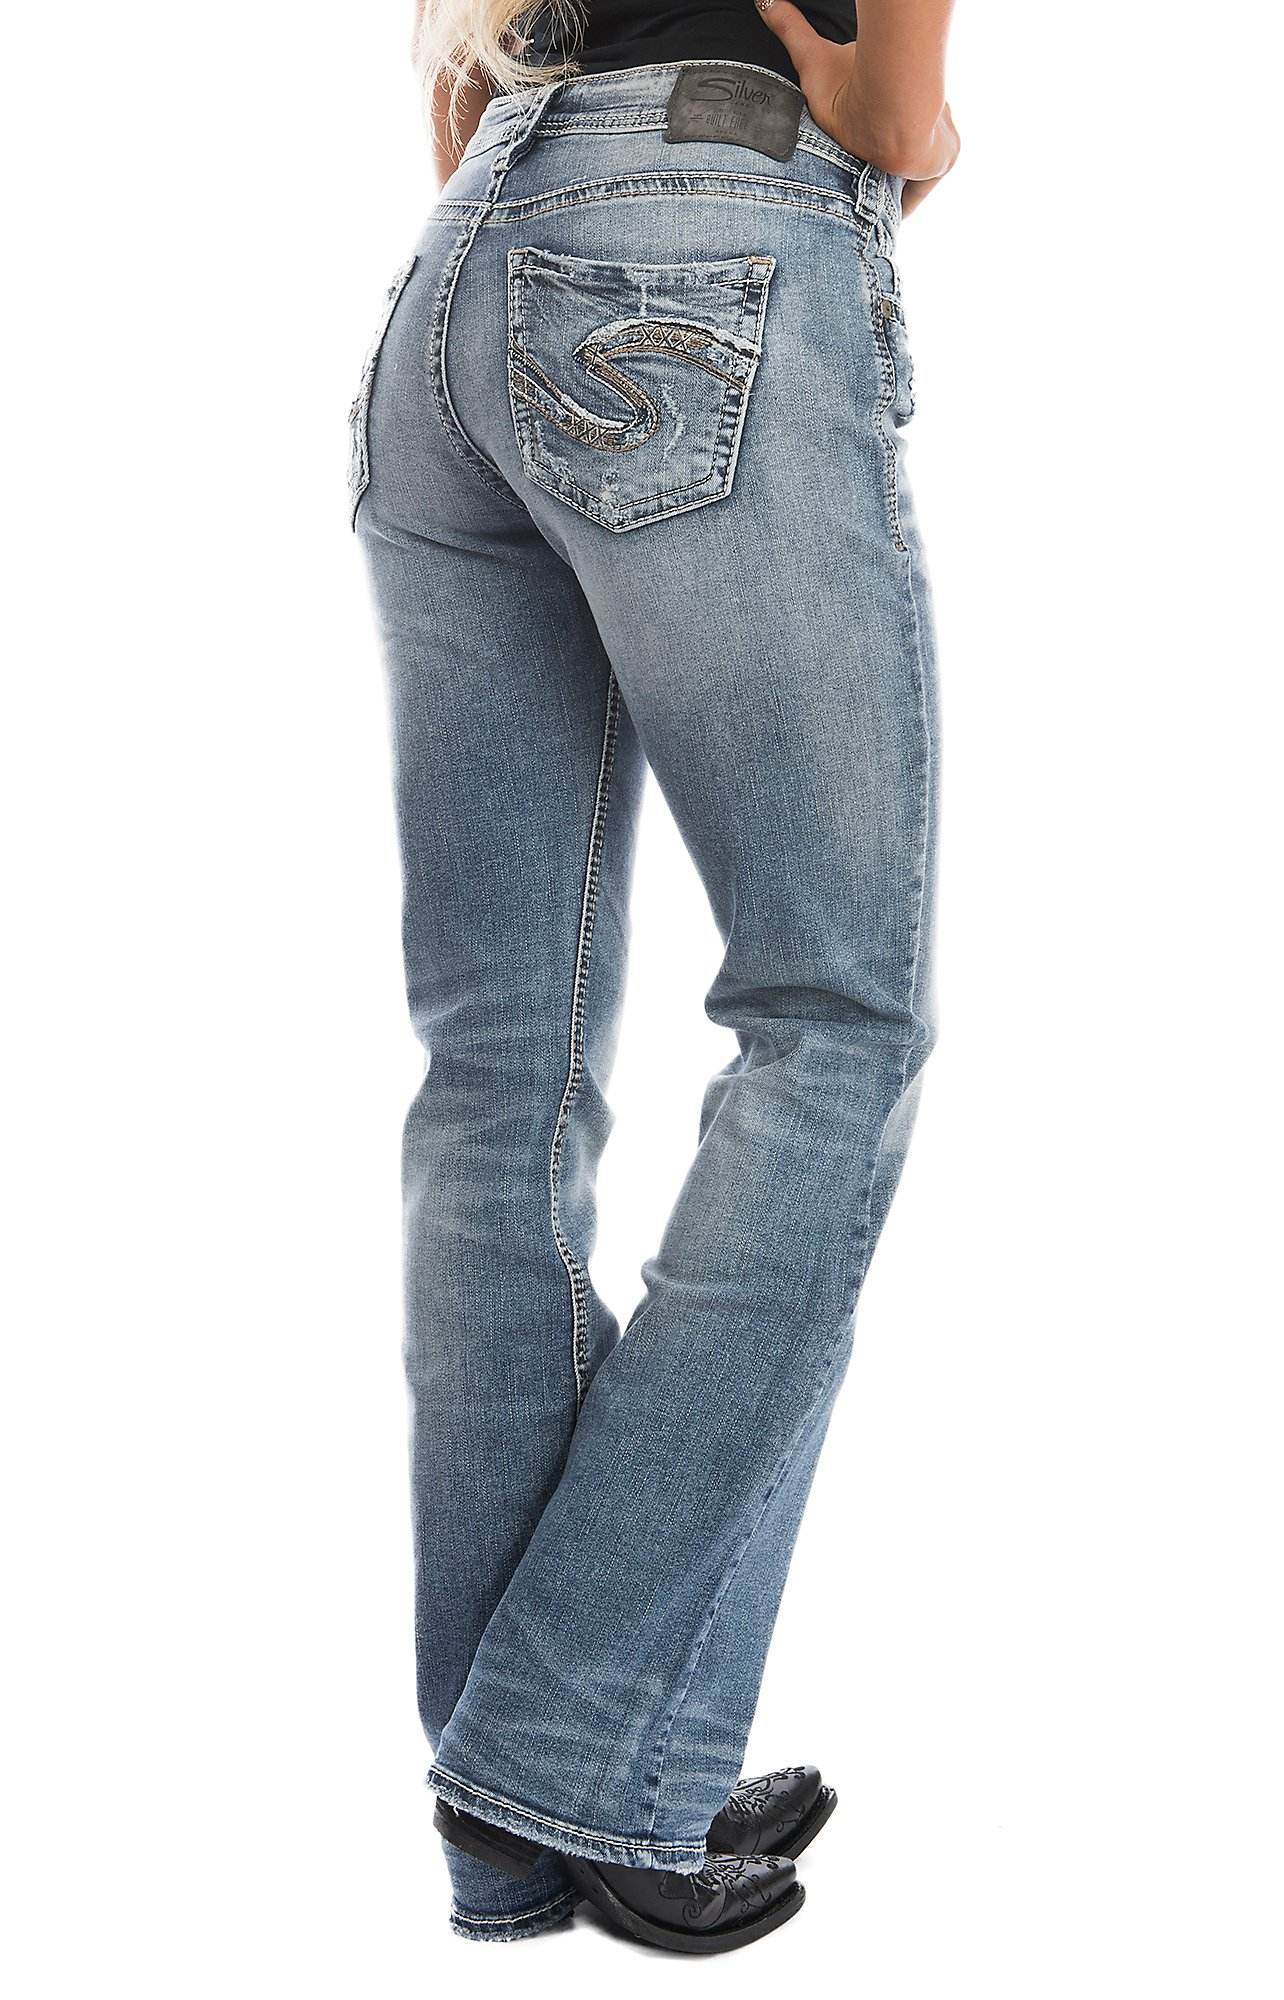 Silver Jeans Suki Women's Indigo High Boot Cut Jeans | Cavender's